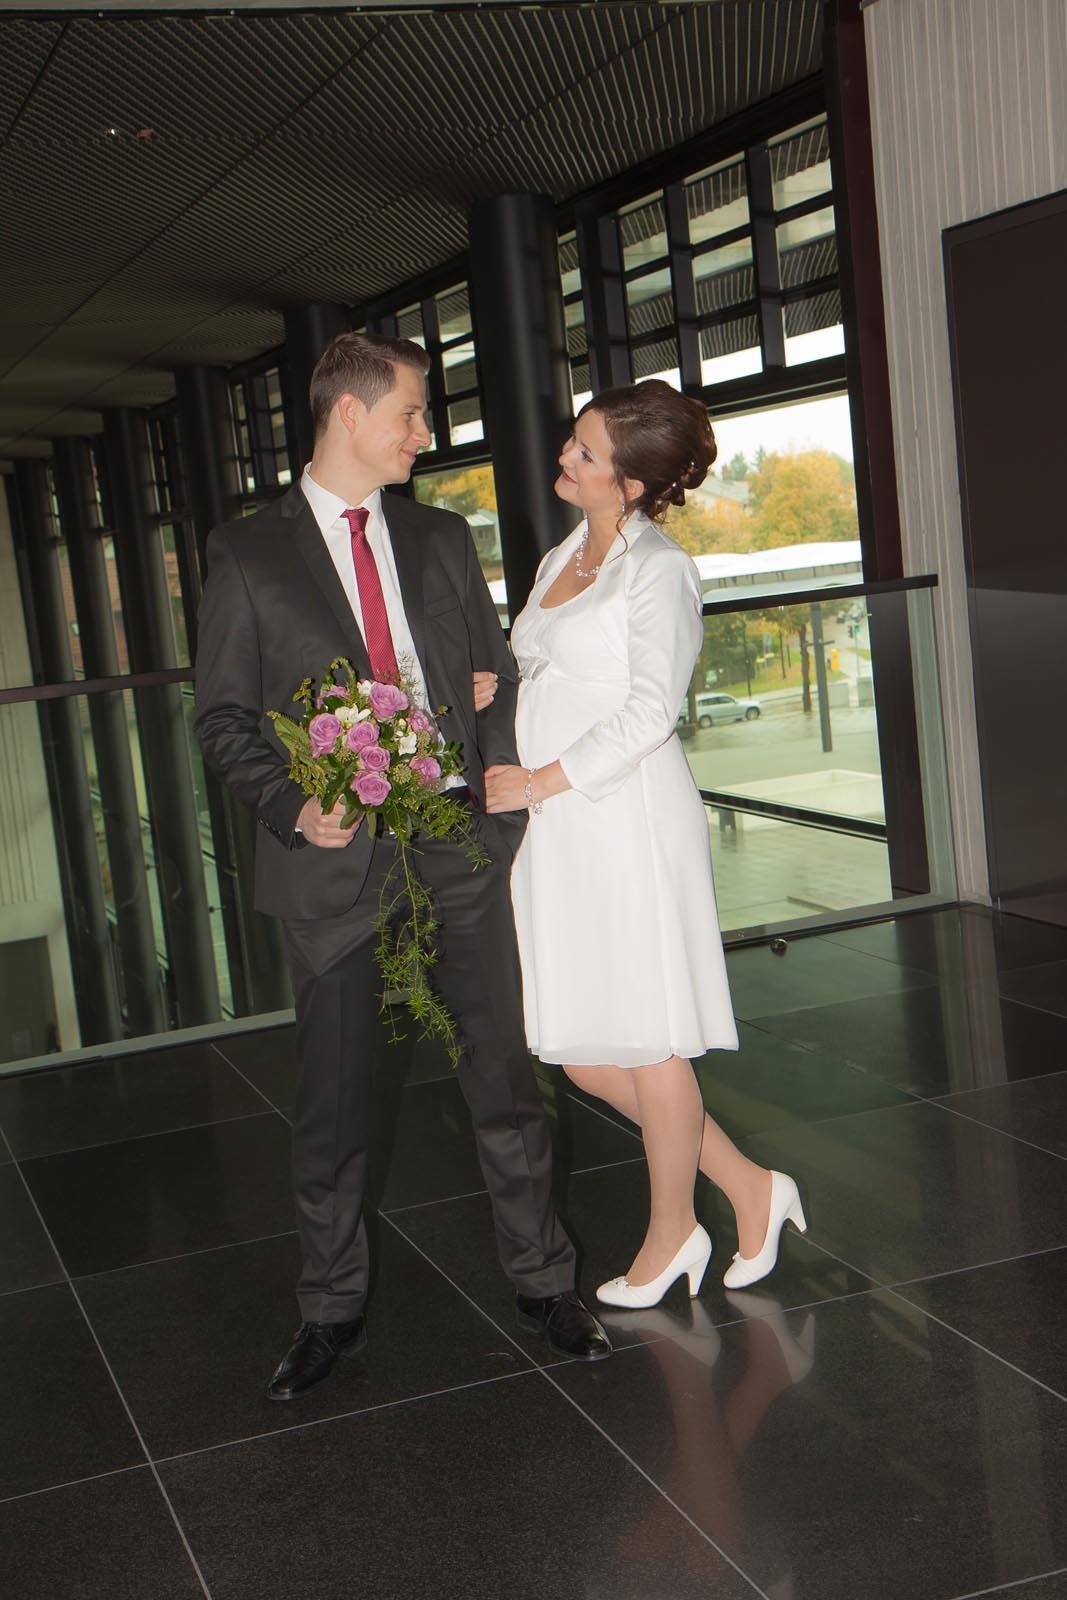 Hochzeit-Fleischmann-Hochzeit-Fleischmann-0380.jpg